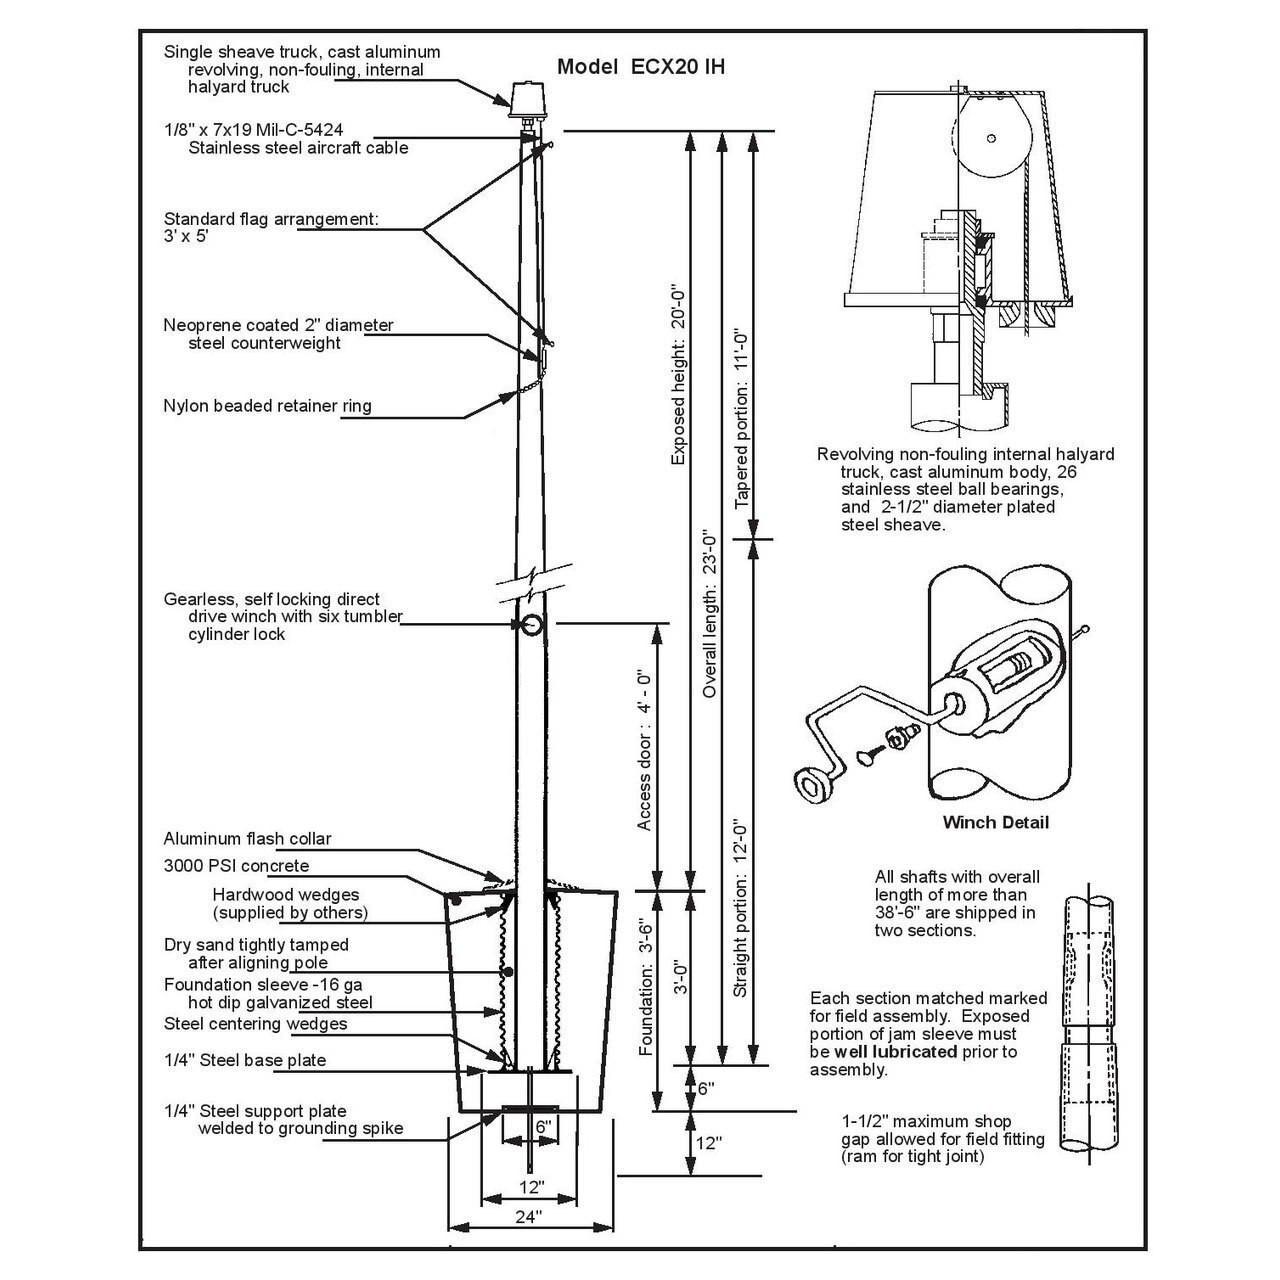 20 Internal Halyard Flagpole w/ Collar ECX20IH